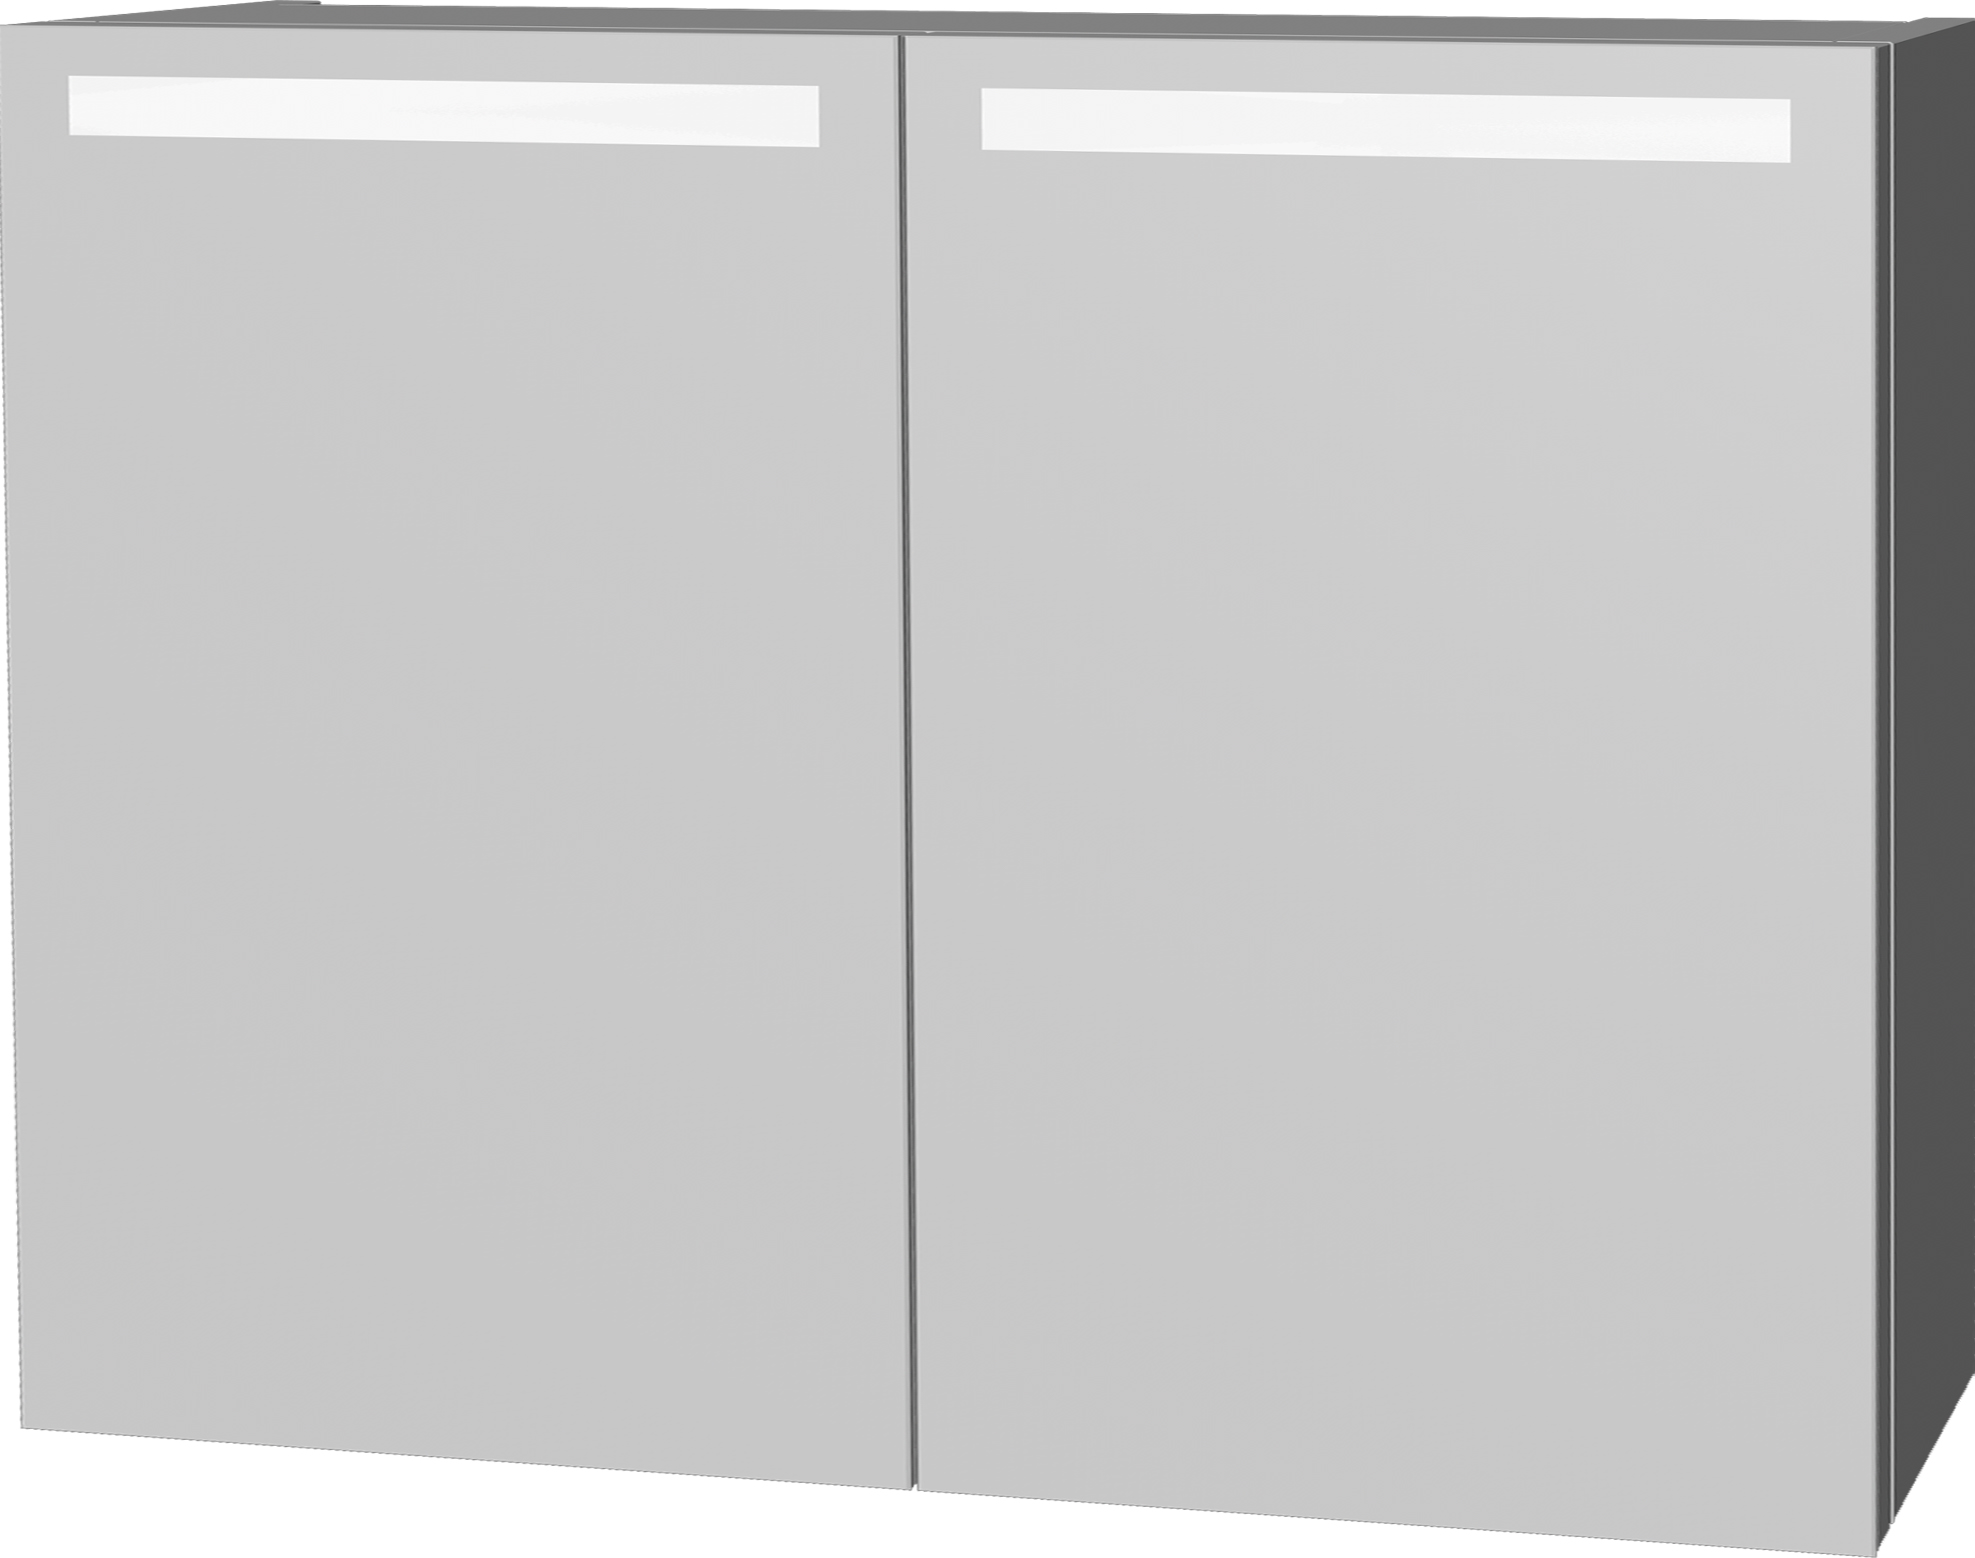 Intedoor Zrcadlová skříňka 100x72 cm, s osvětlením DZS100